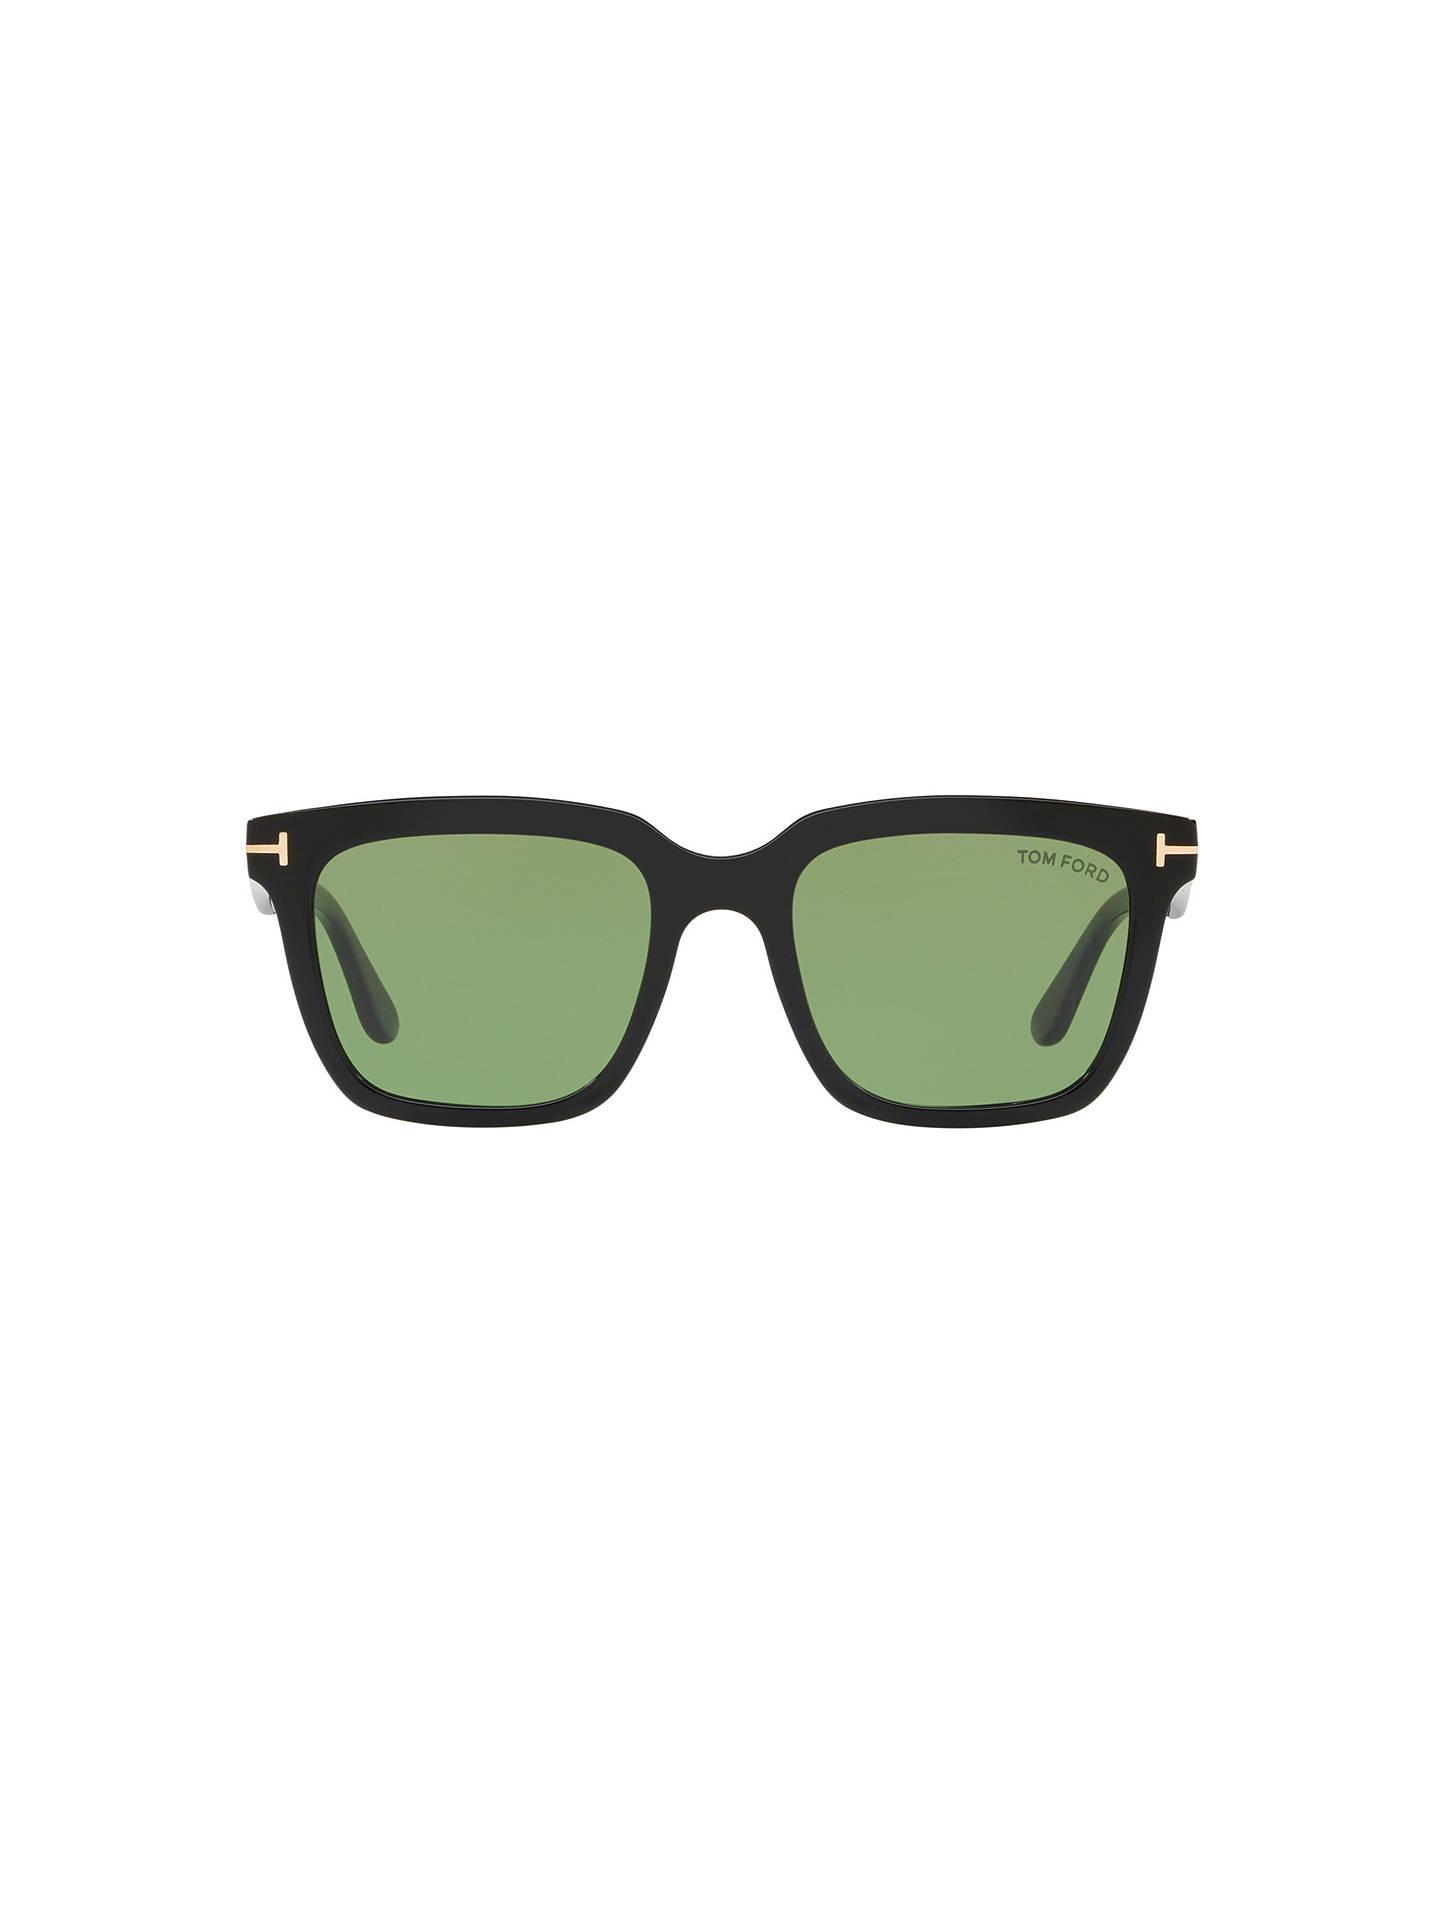 ec55e05780a TOM FORD FT0646 Men s Marco Rectangular Sunglasses at John Lewis ...